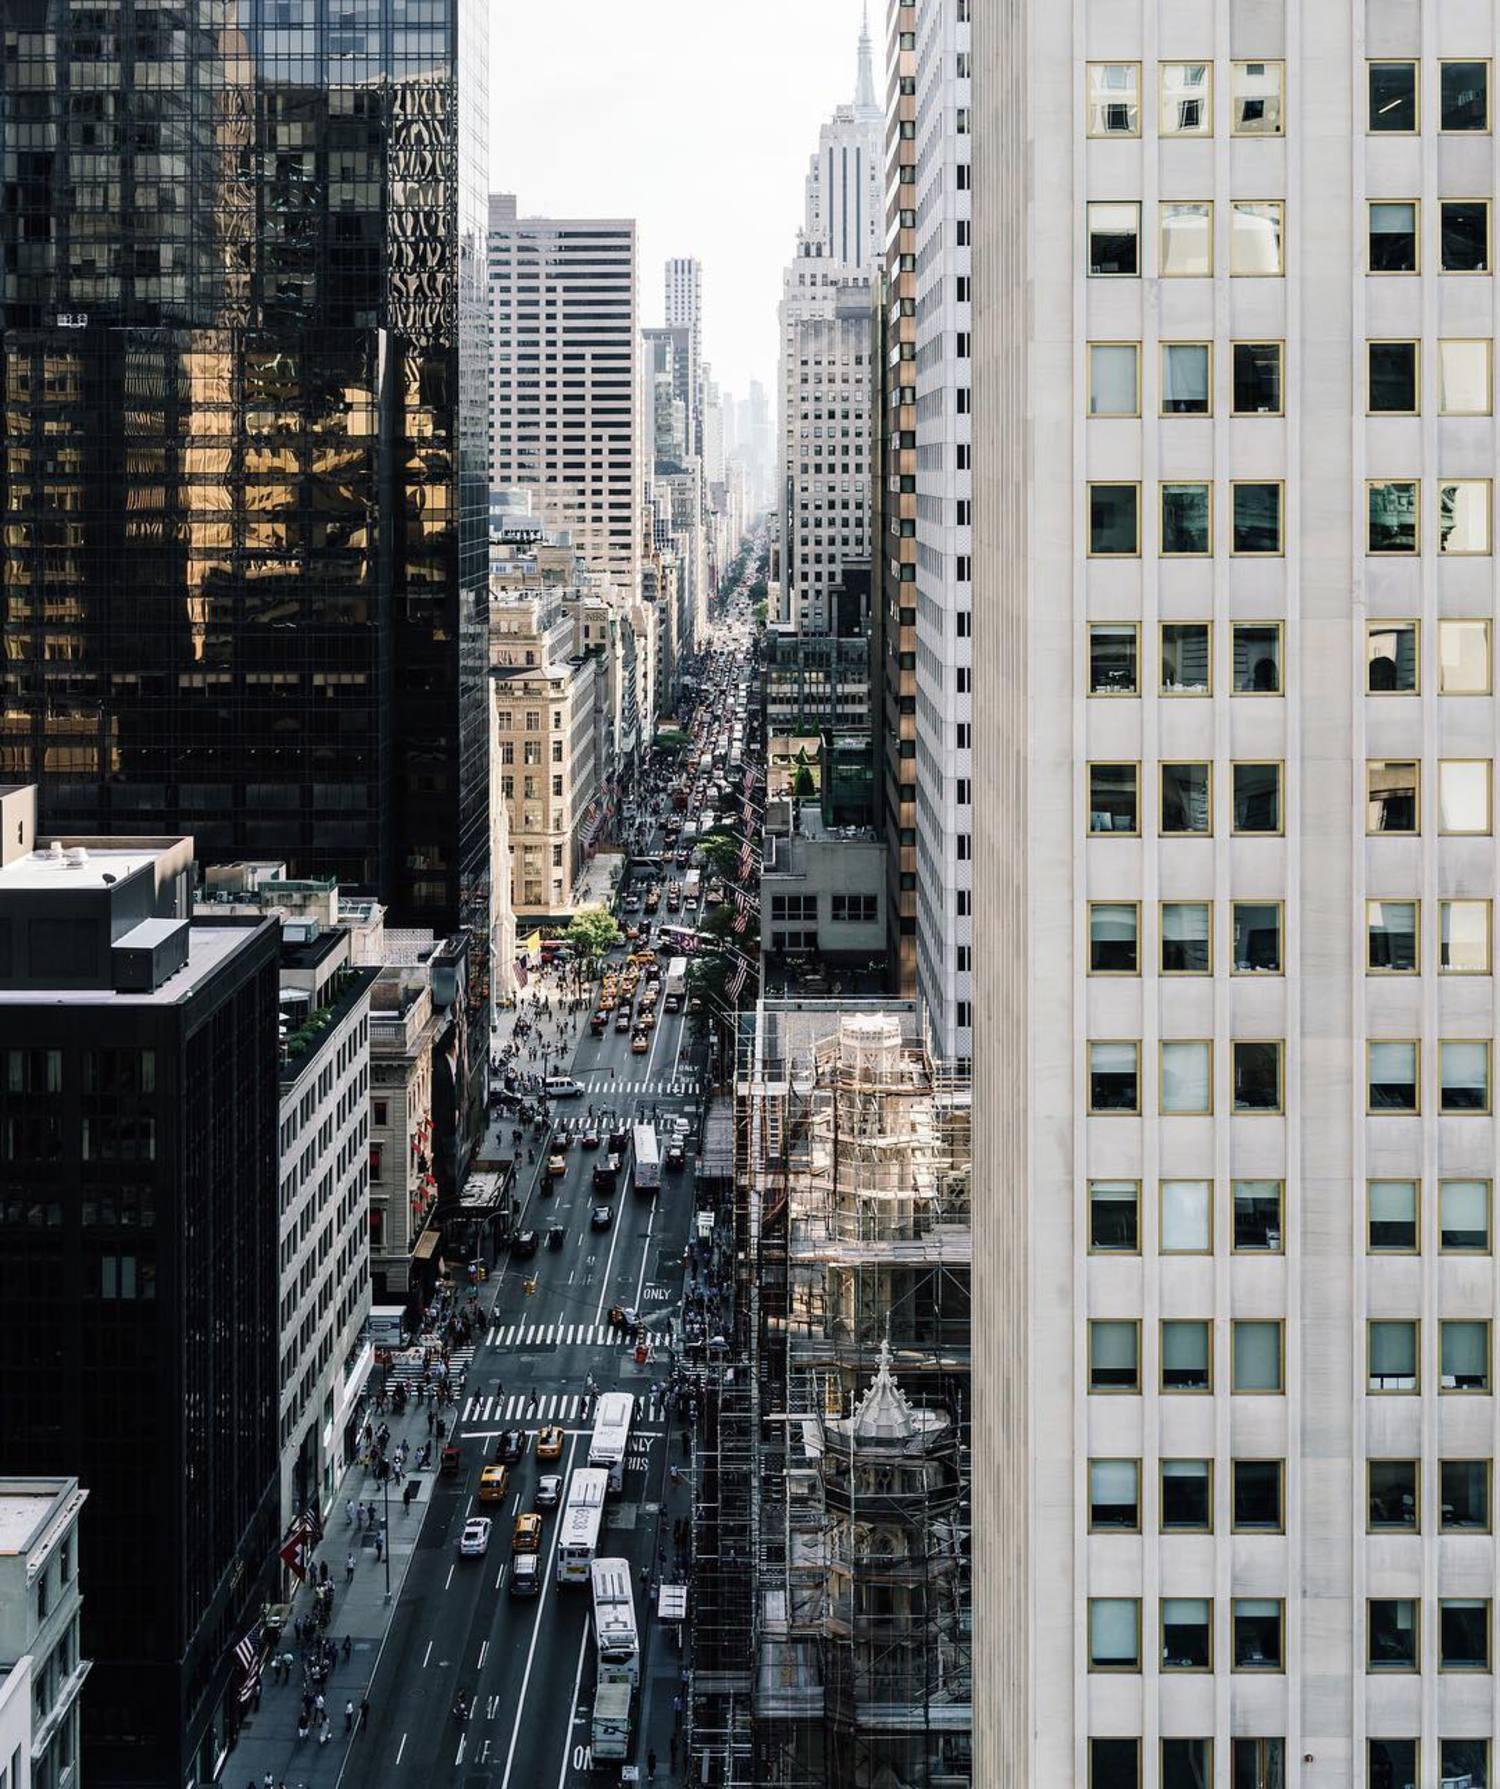 This city 💙